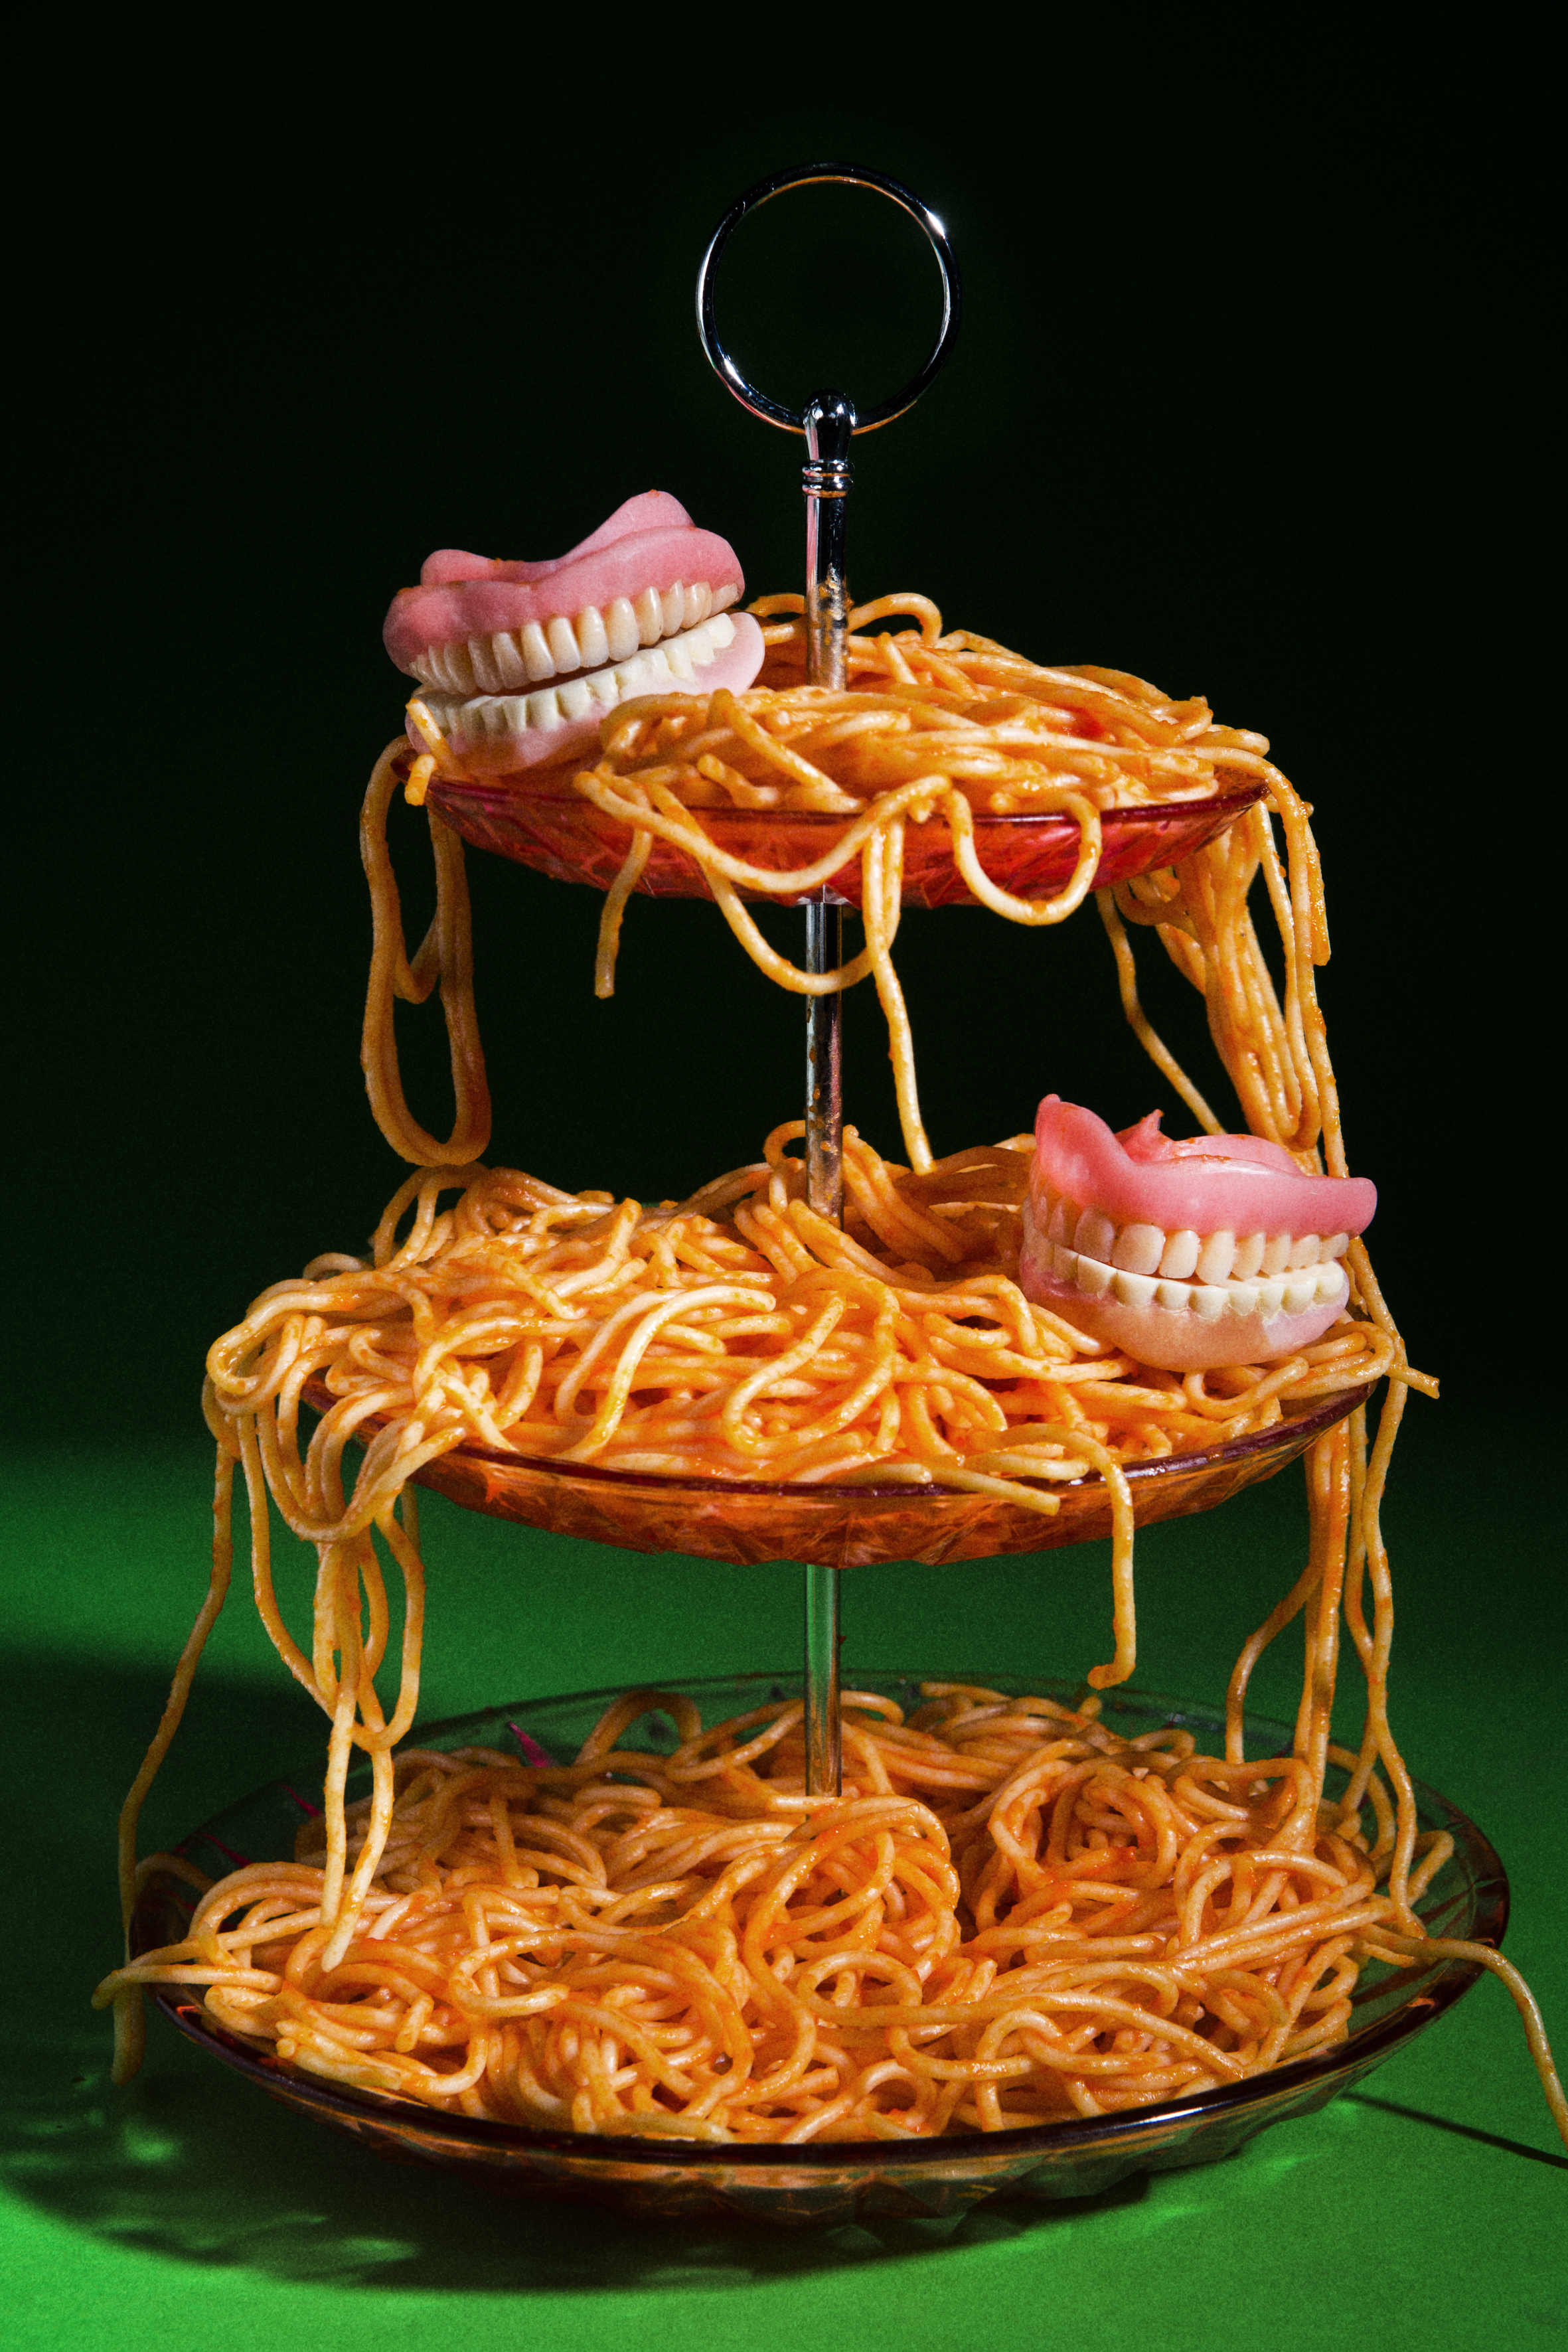 Espaguetis.jpg